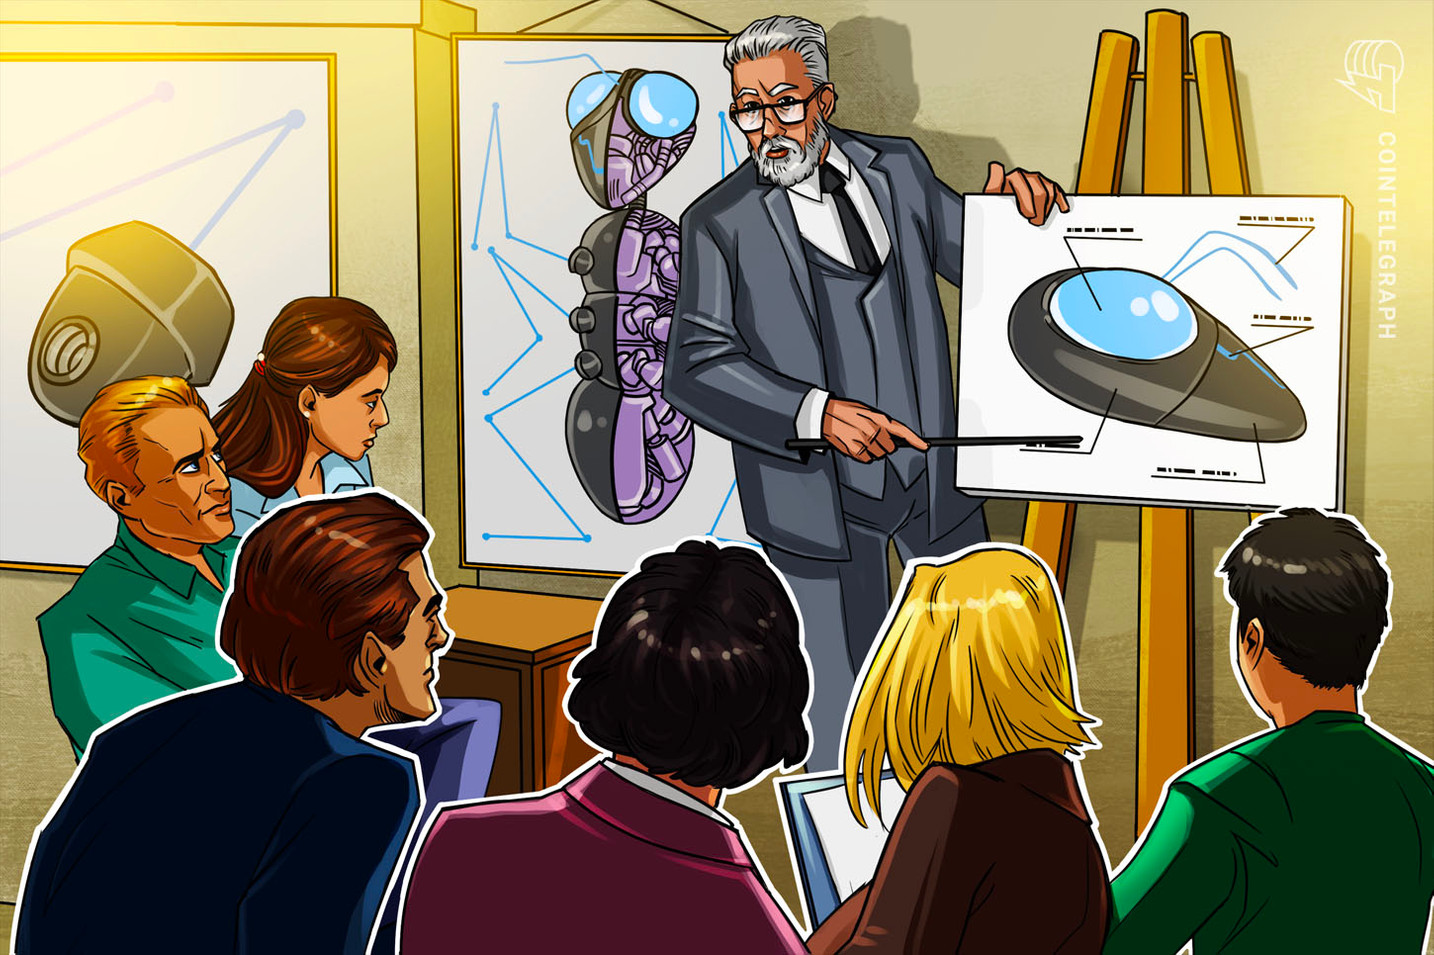 VC kompanija Andreassen Horowitz predstavila instruktore u besplatnoj kripto školi